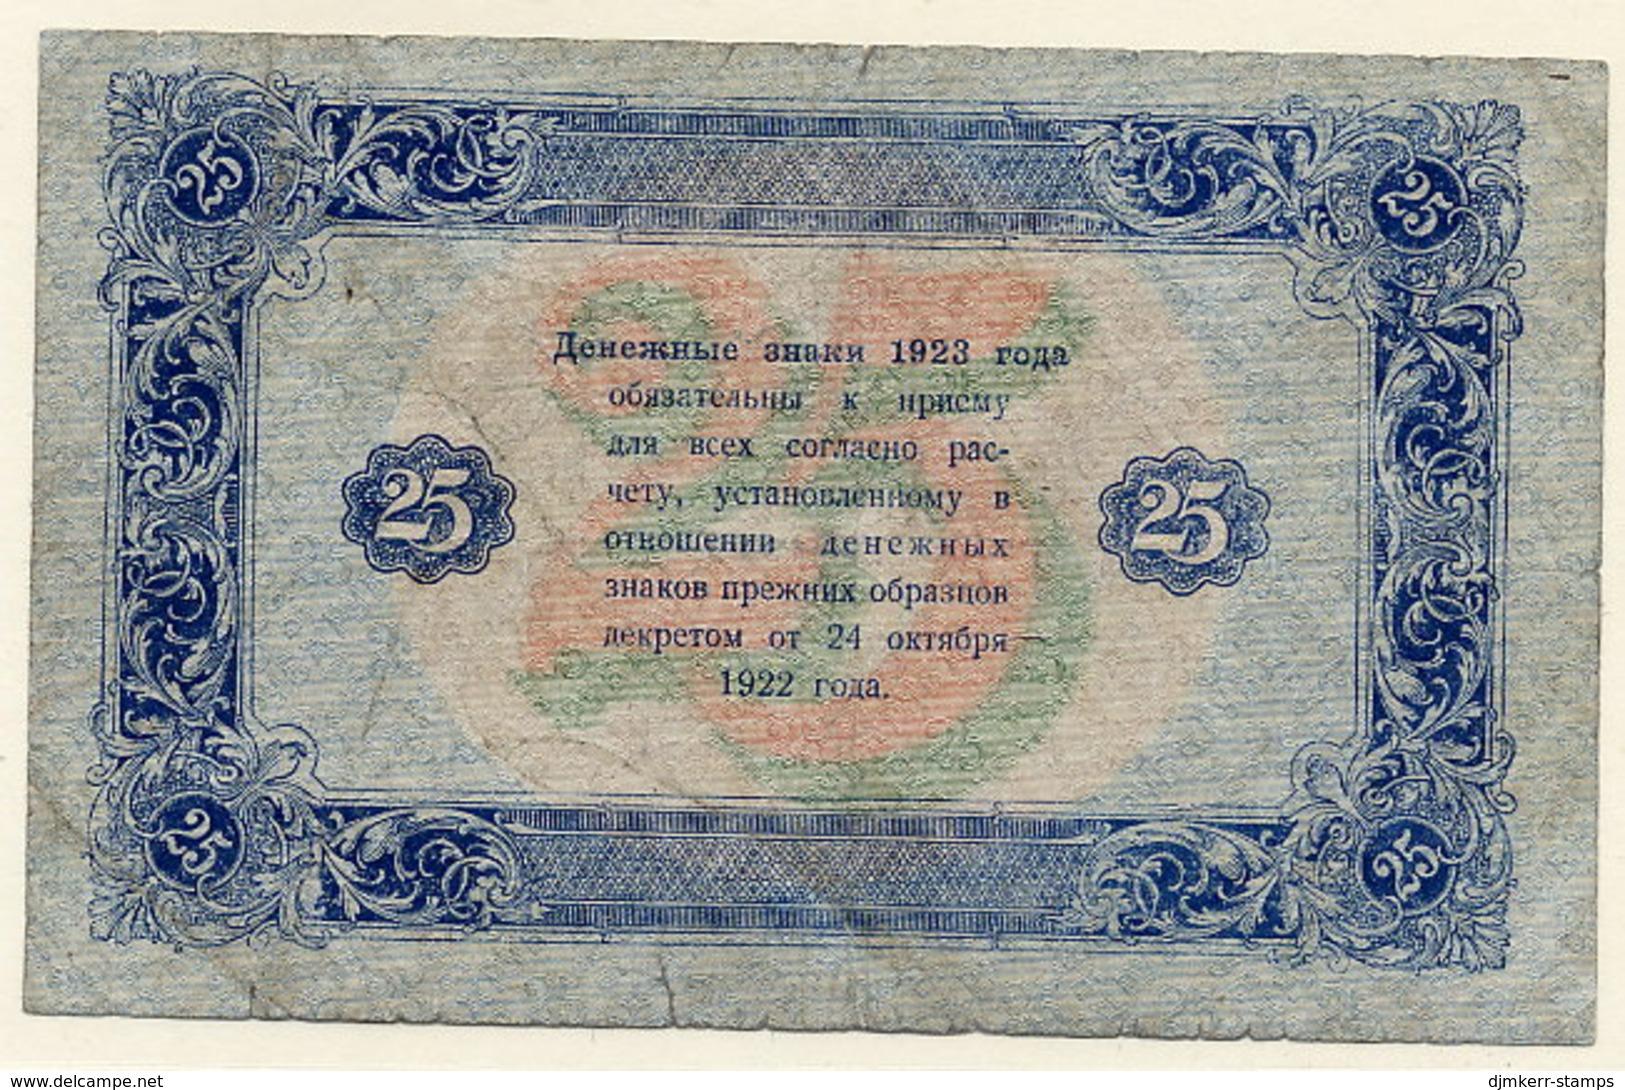 RSFSR 1923 25 Rub. 2nd Issue  VF  P166 - Russia